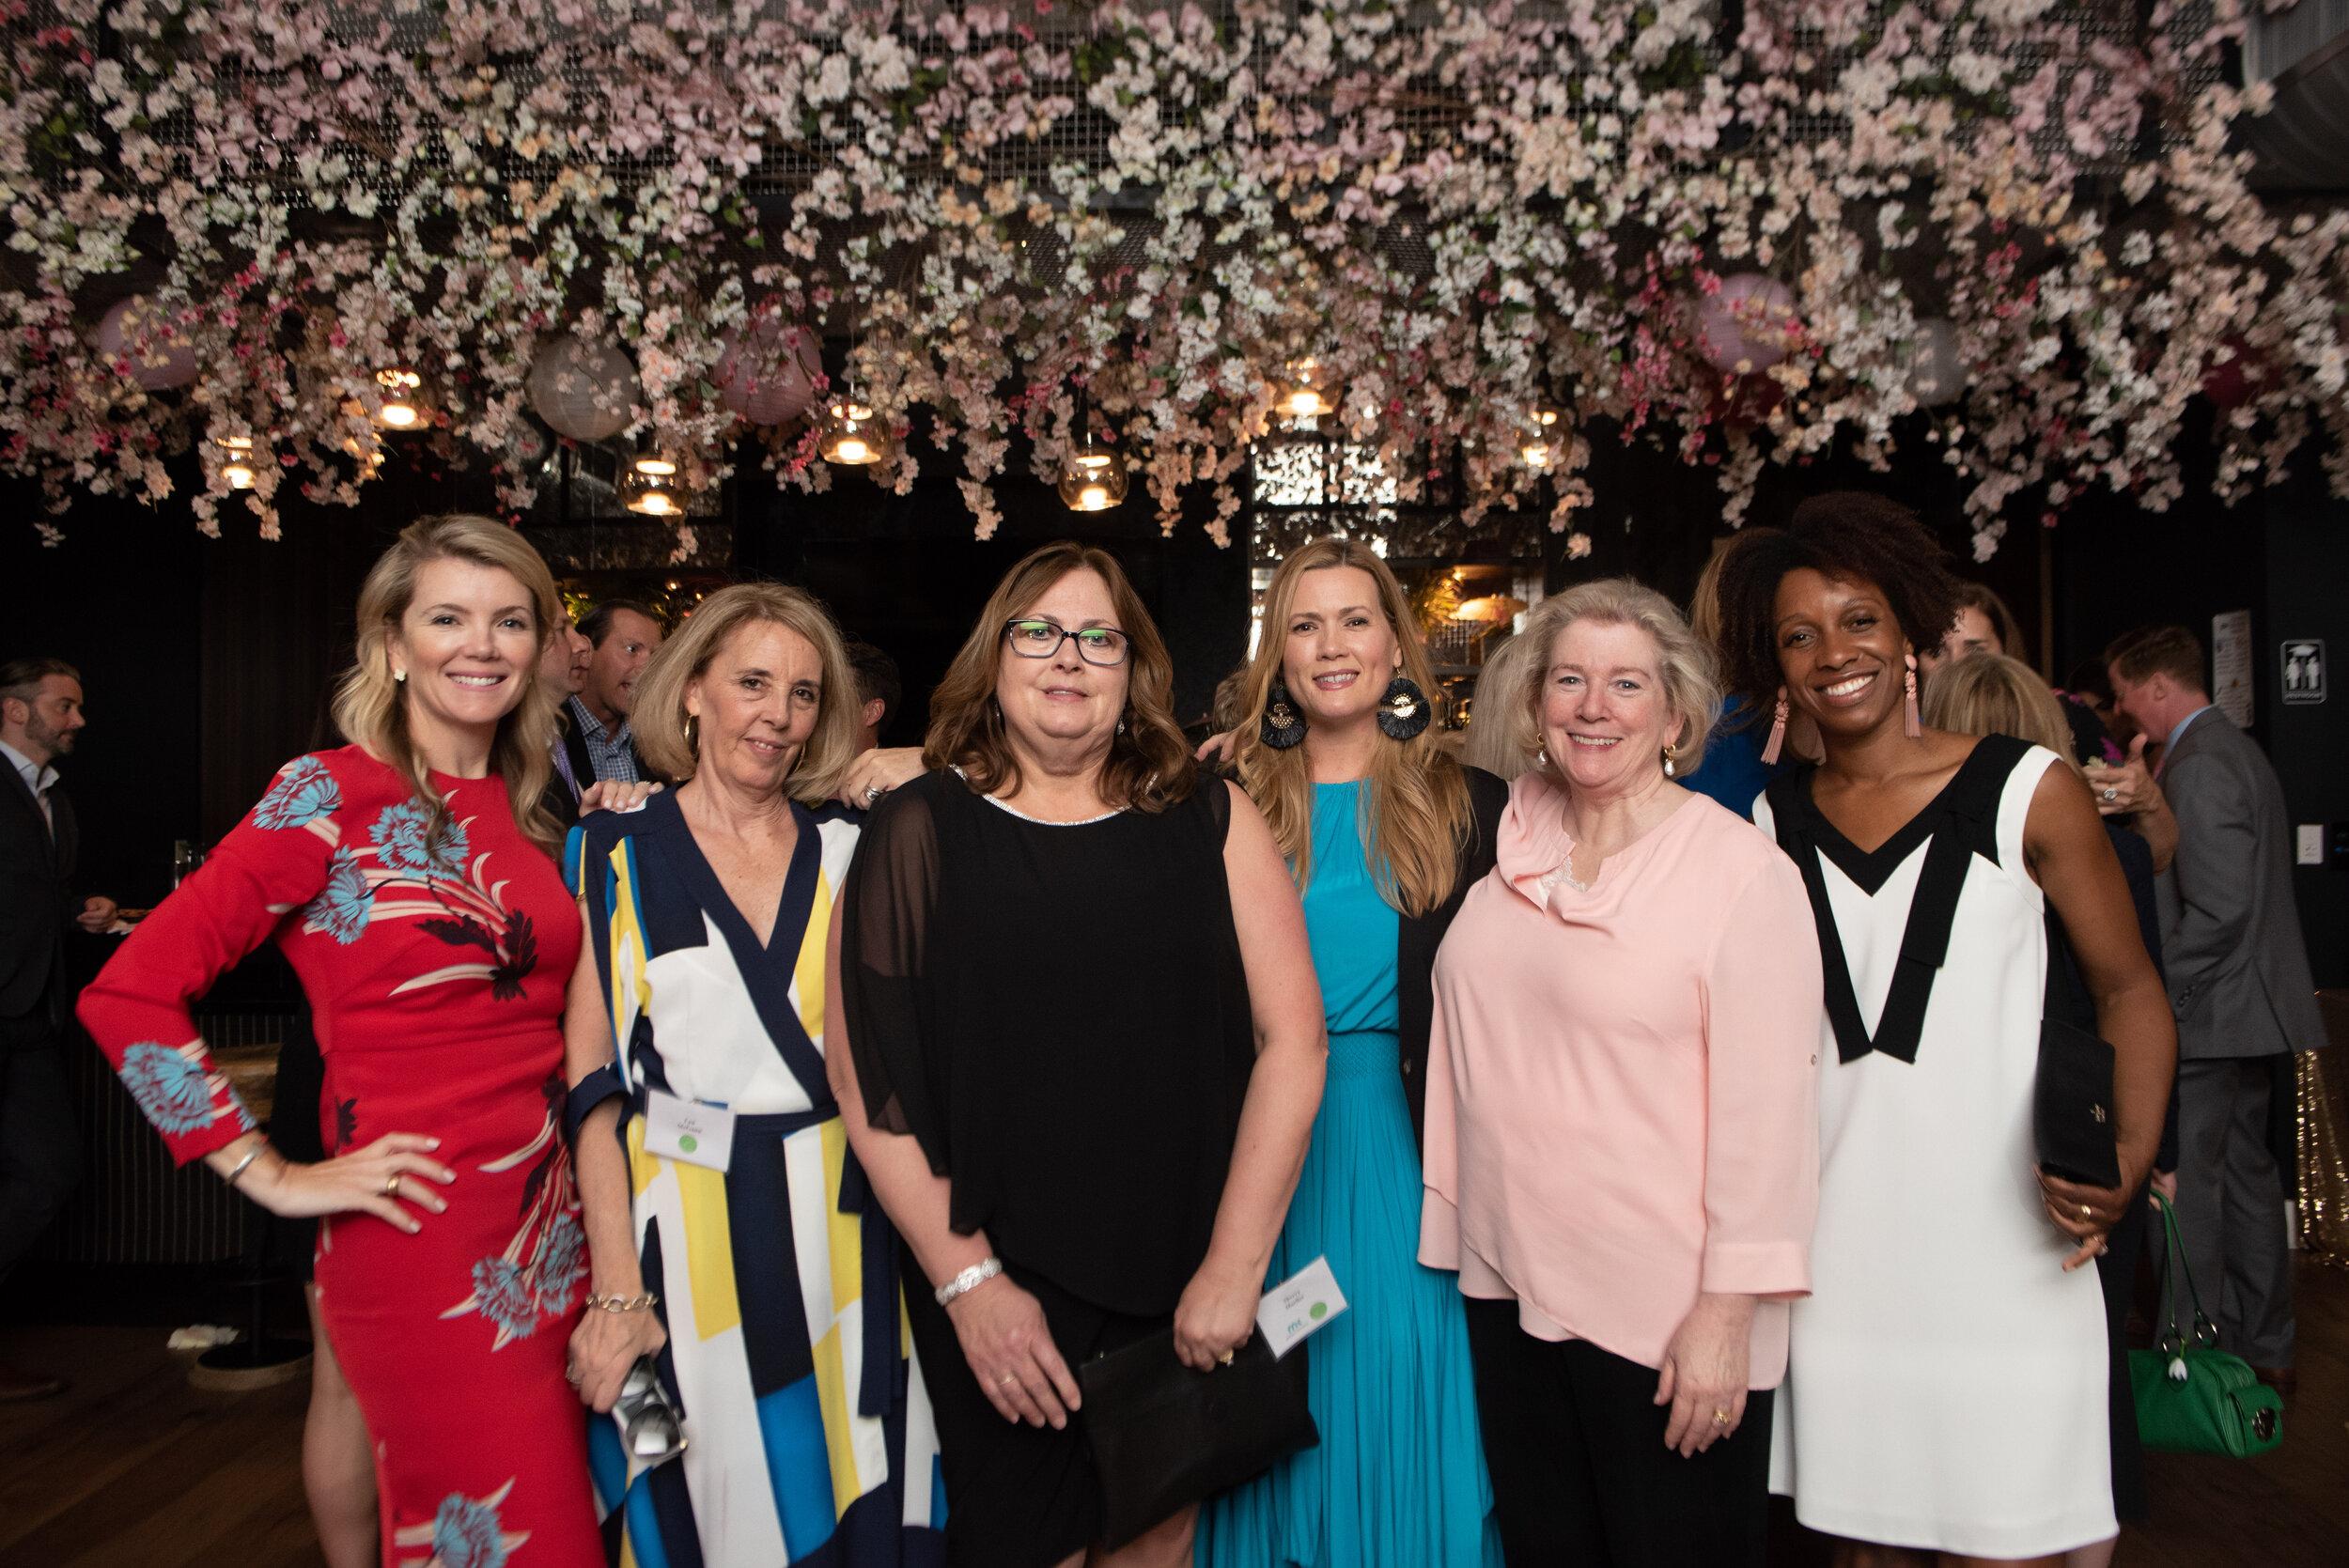 1. Christie Stute, Lyn McGann, Sherry Moeller, Liz Levin, Enid McKitrick, Kia Weatherspoon.jpg